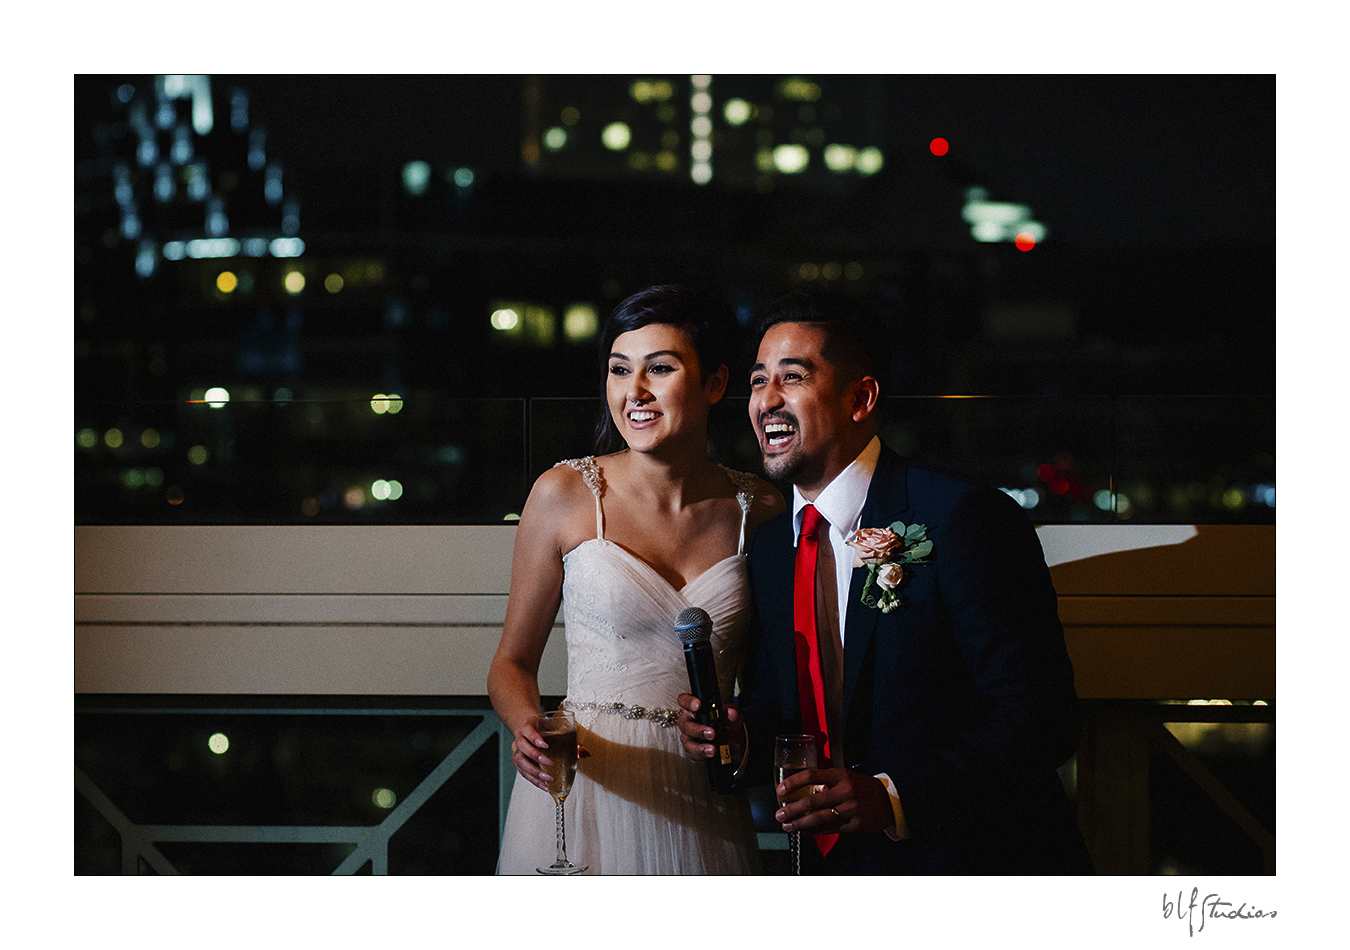 0041-blfstudios-wedding-photographer-daniel-danielle-atlanta.jpg